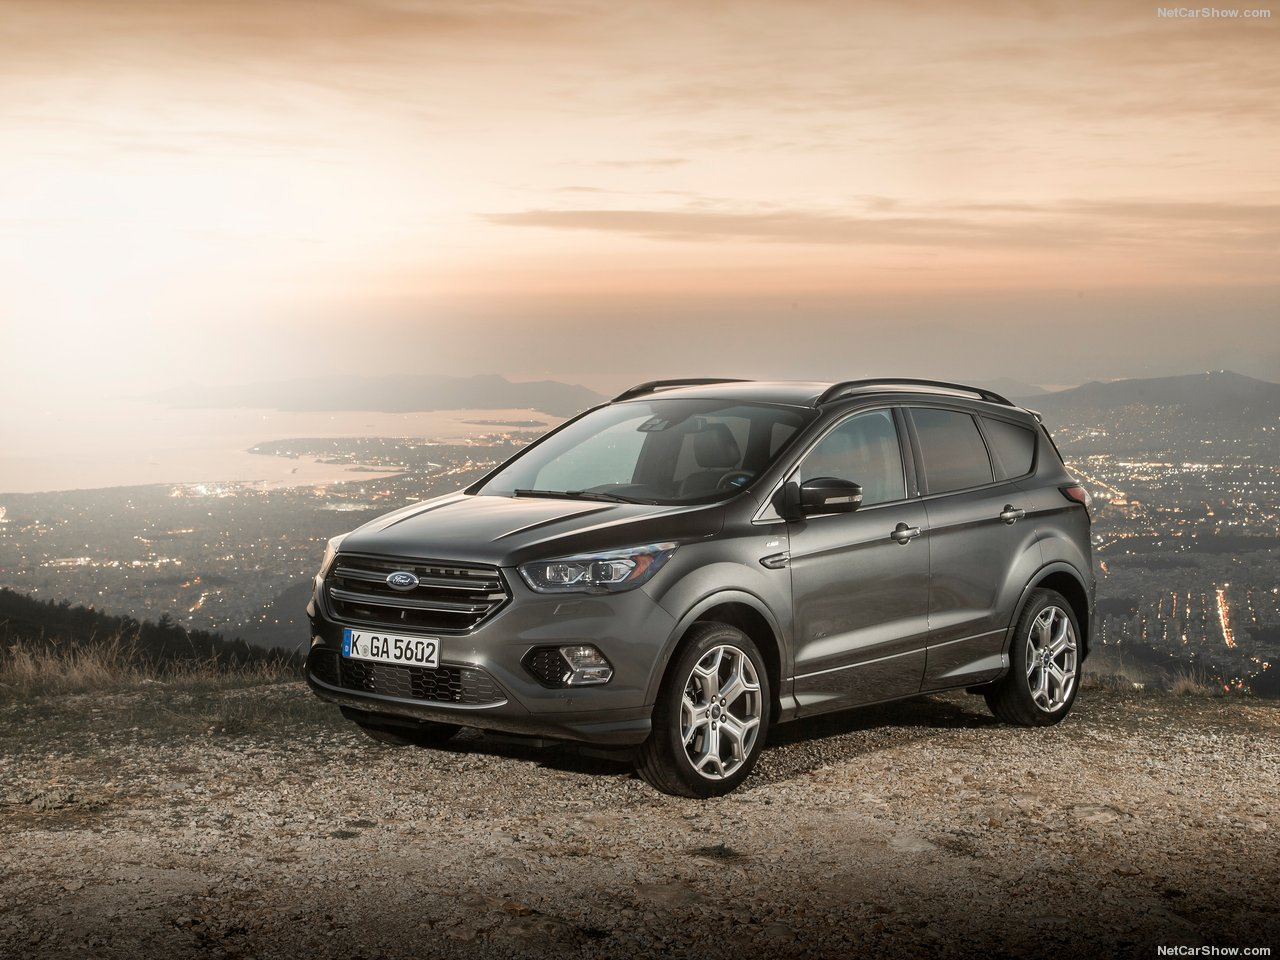 Форд Куга 2017 в новом кузове комплектации и цены фото технические характеристики видео тест драйв